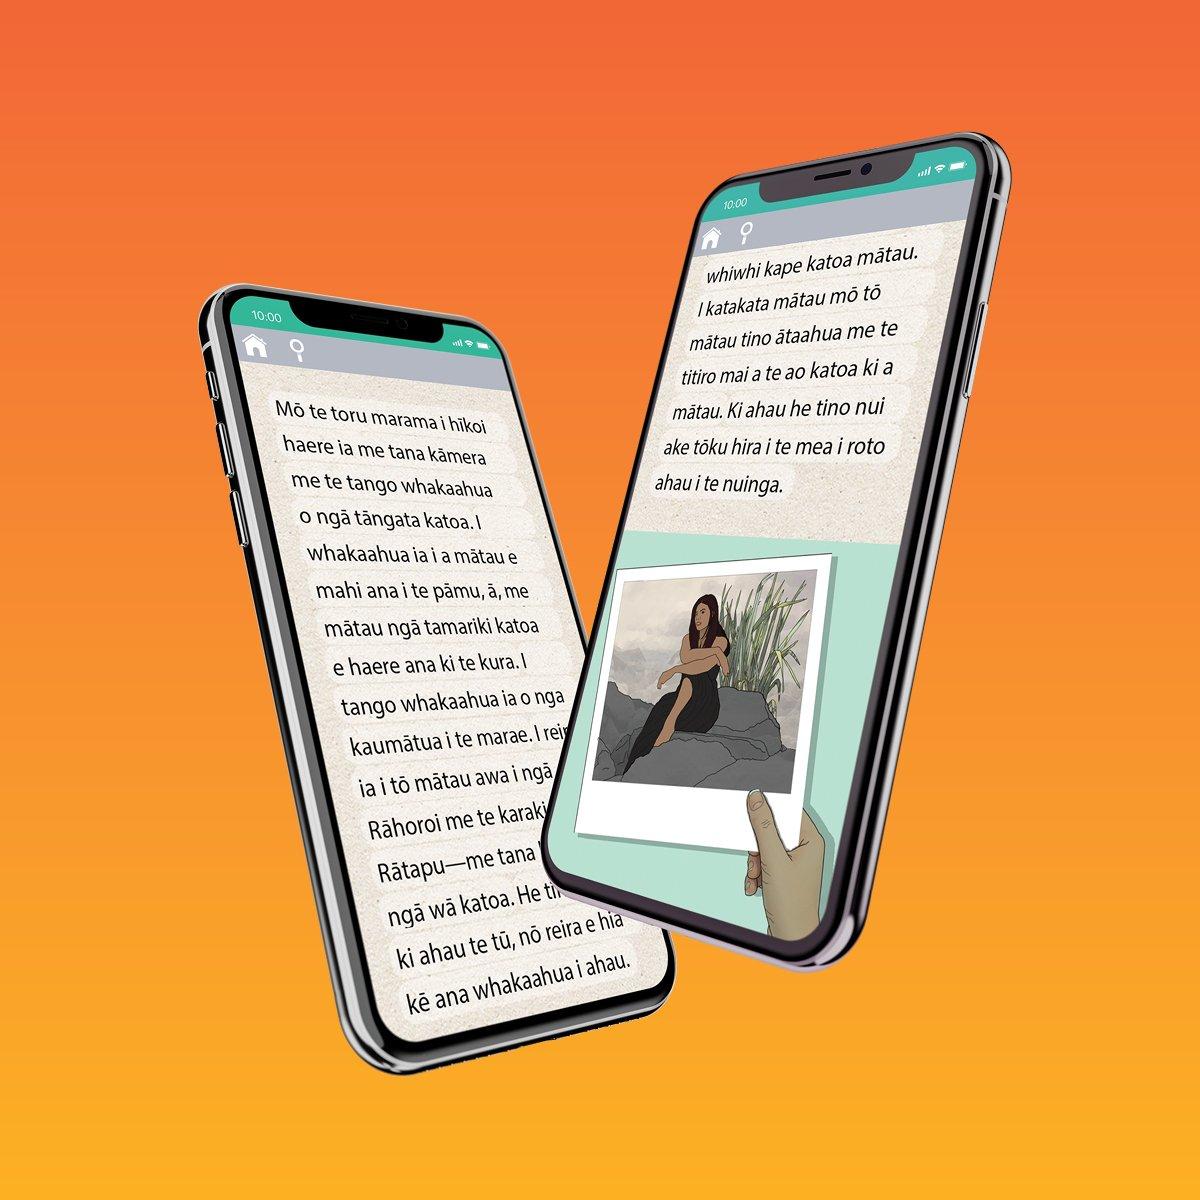 Lingogo-Libraries-DigitalAssets-1200x1200